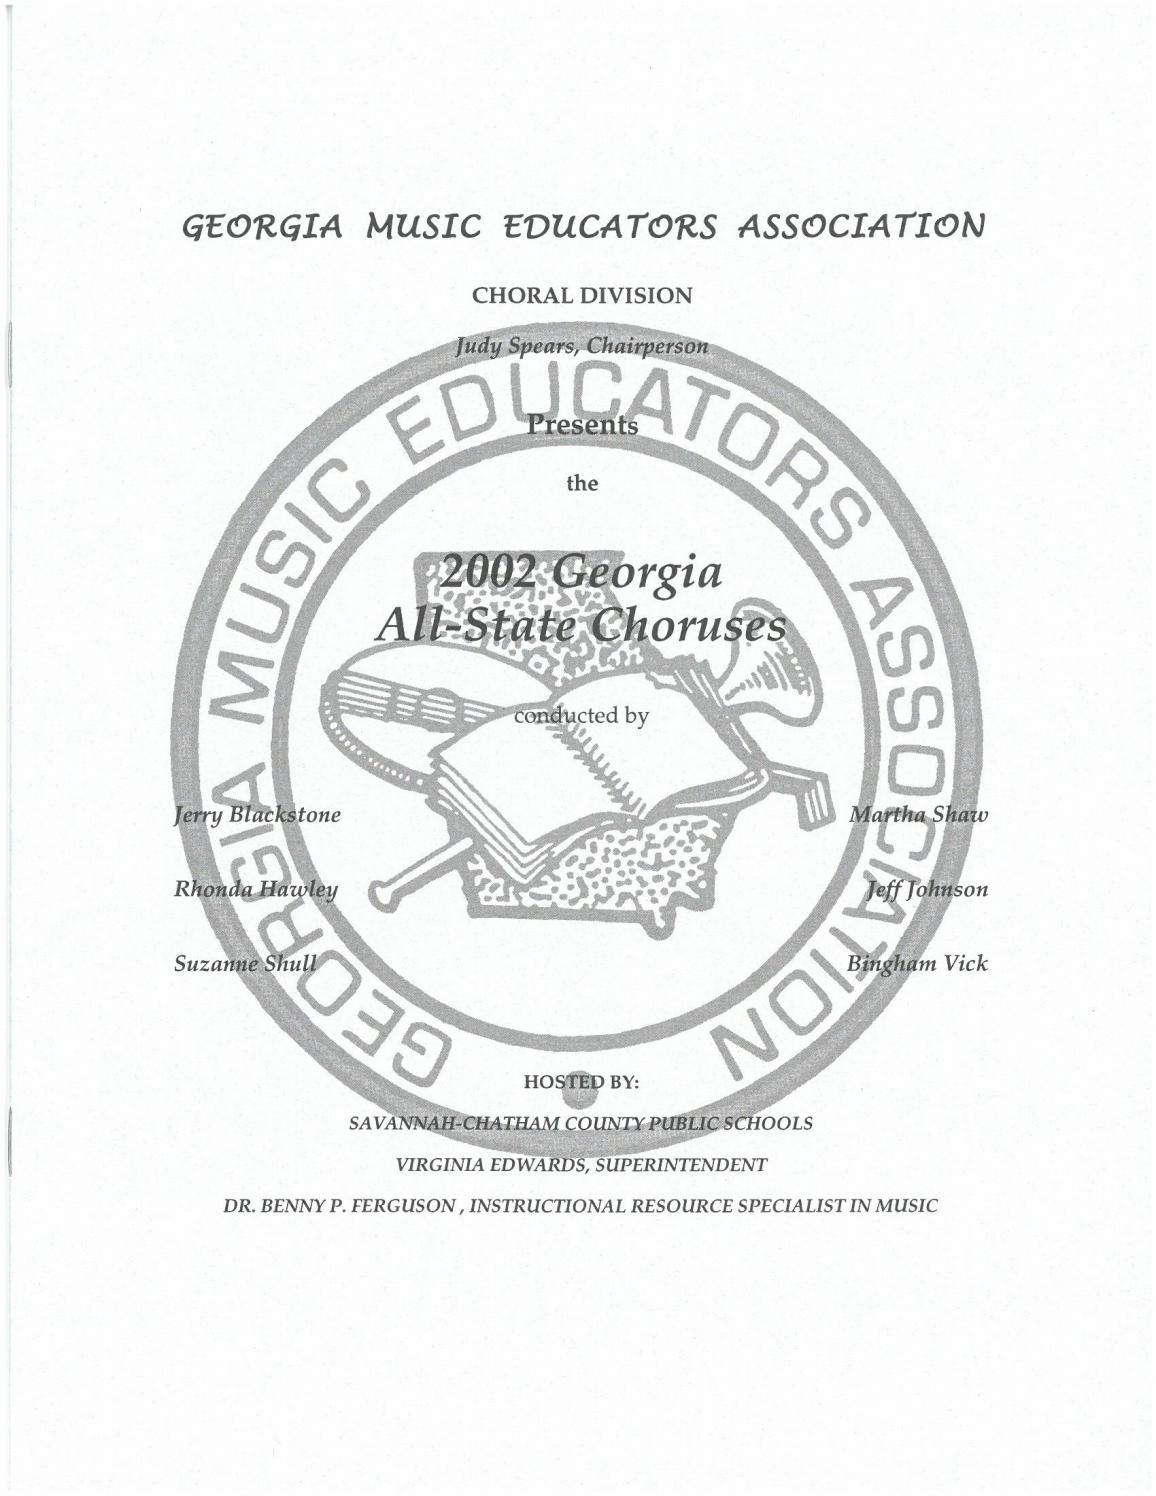 2002 GMEA All-State Chorus Program by Georgia Music